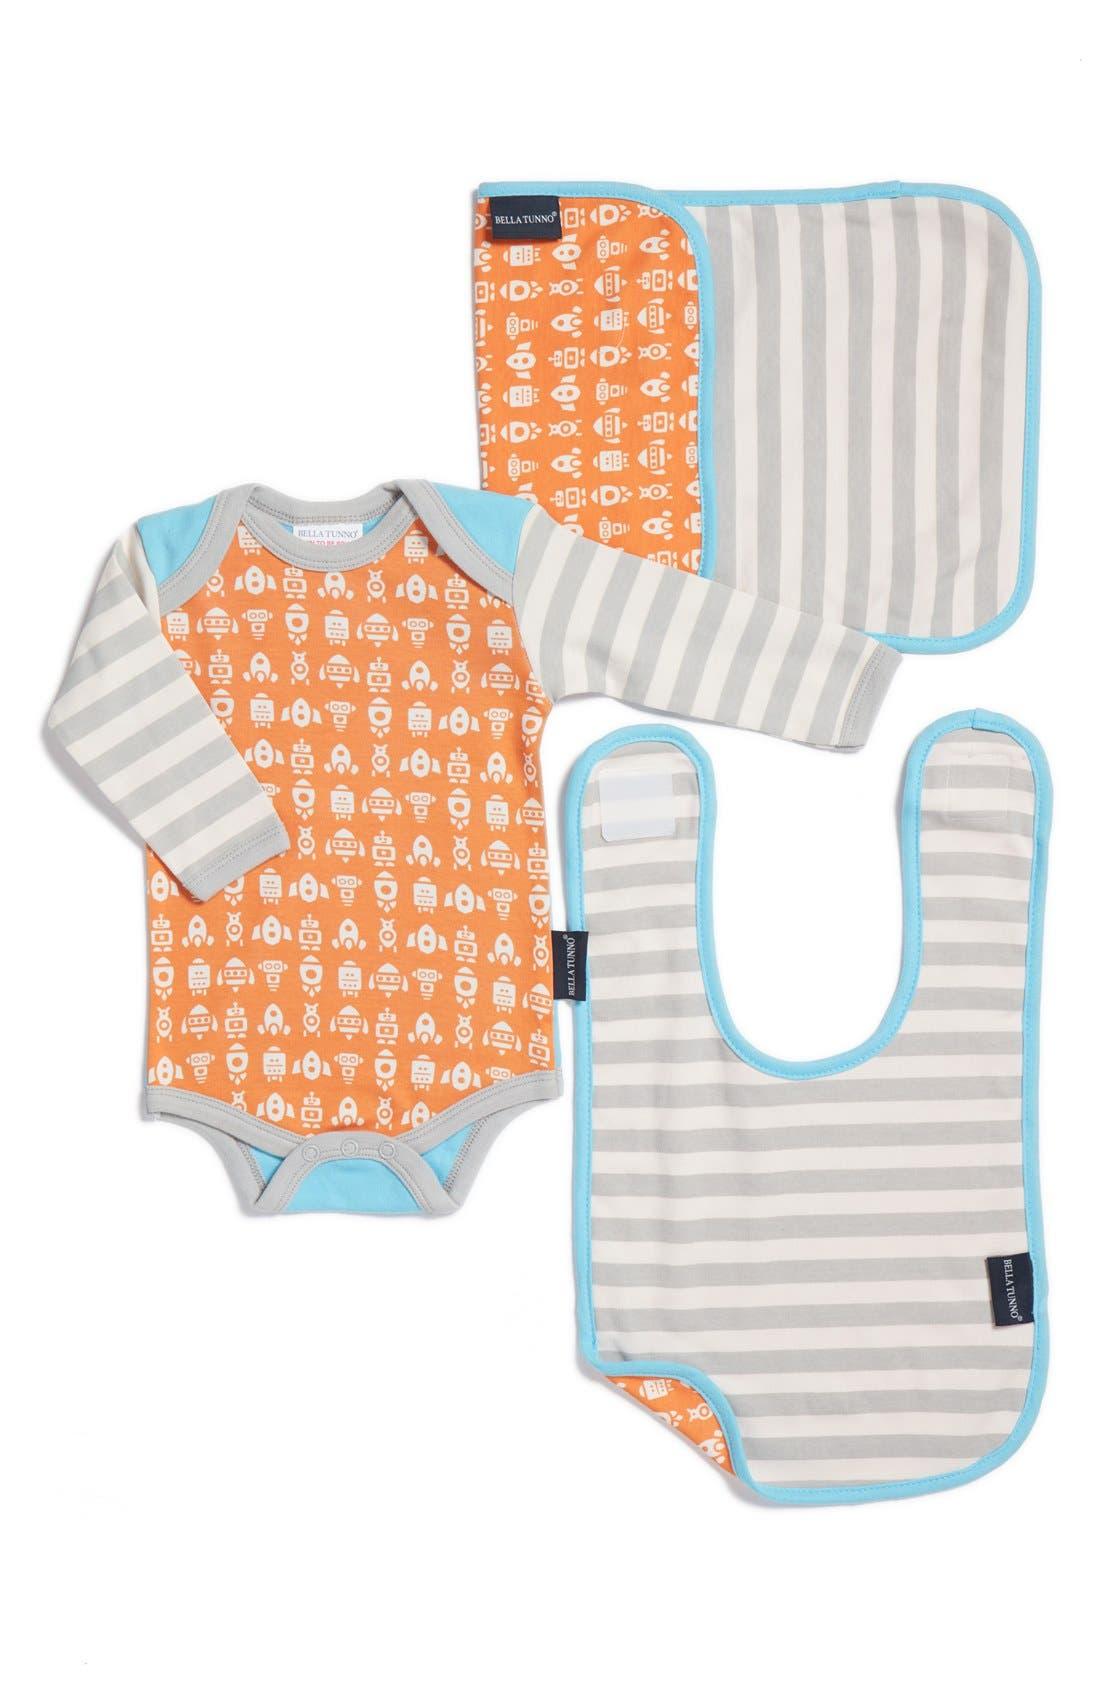 BELLA TUNNO Bodysuit, Bib & Burpie Cloth Set